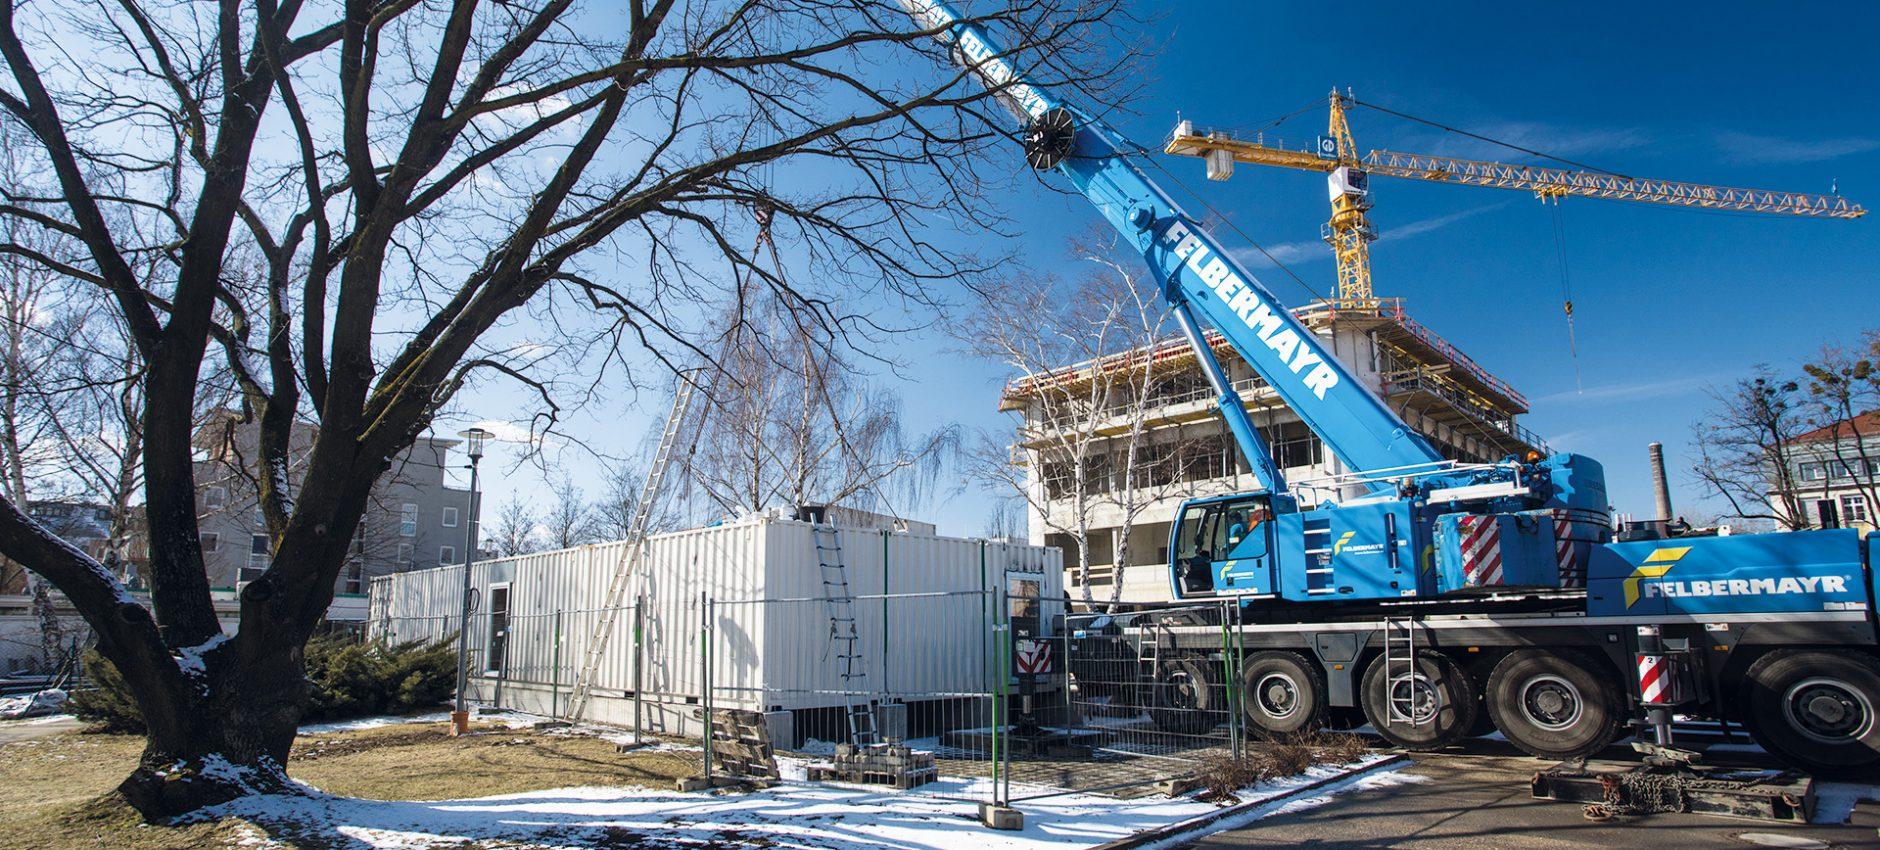 0017_NCT_Dresden_Aufbau_Container_1920x1000_72dpi.jpg